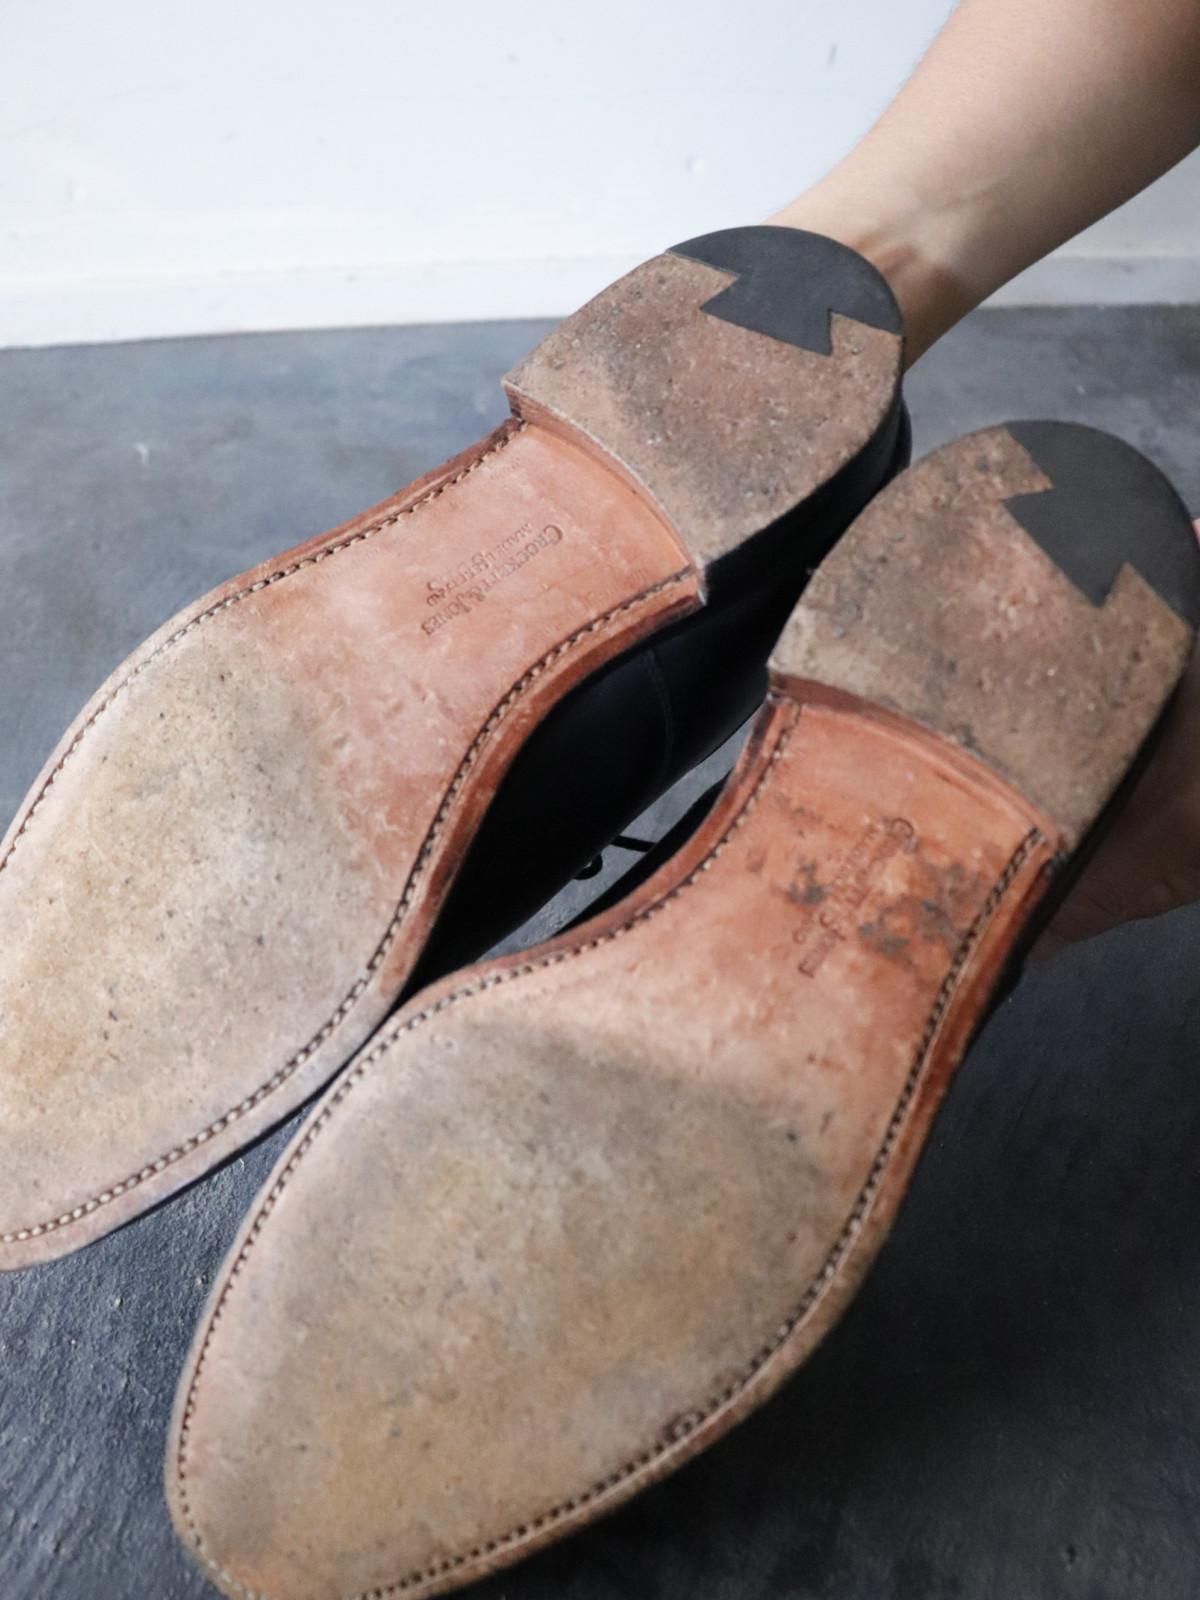 Crocket and johns,England,shoes